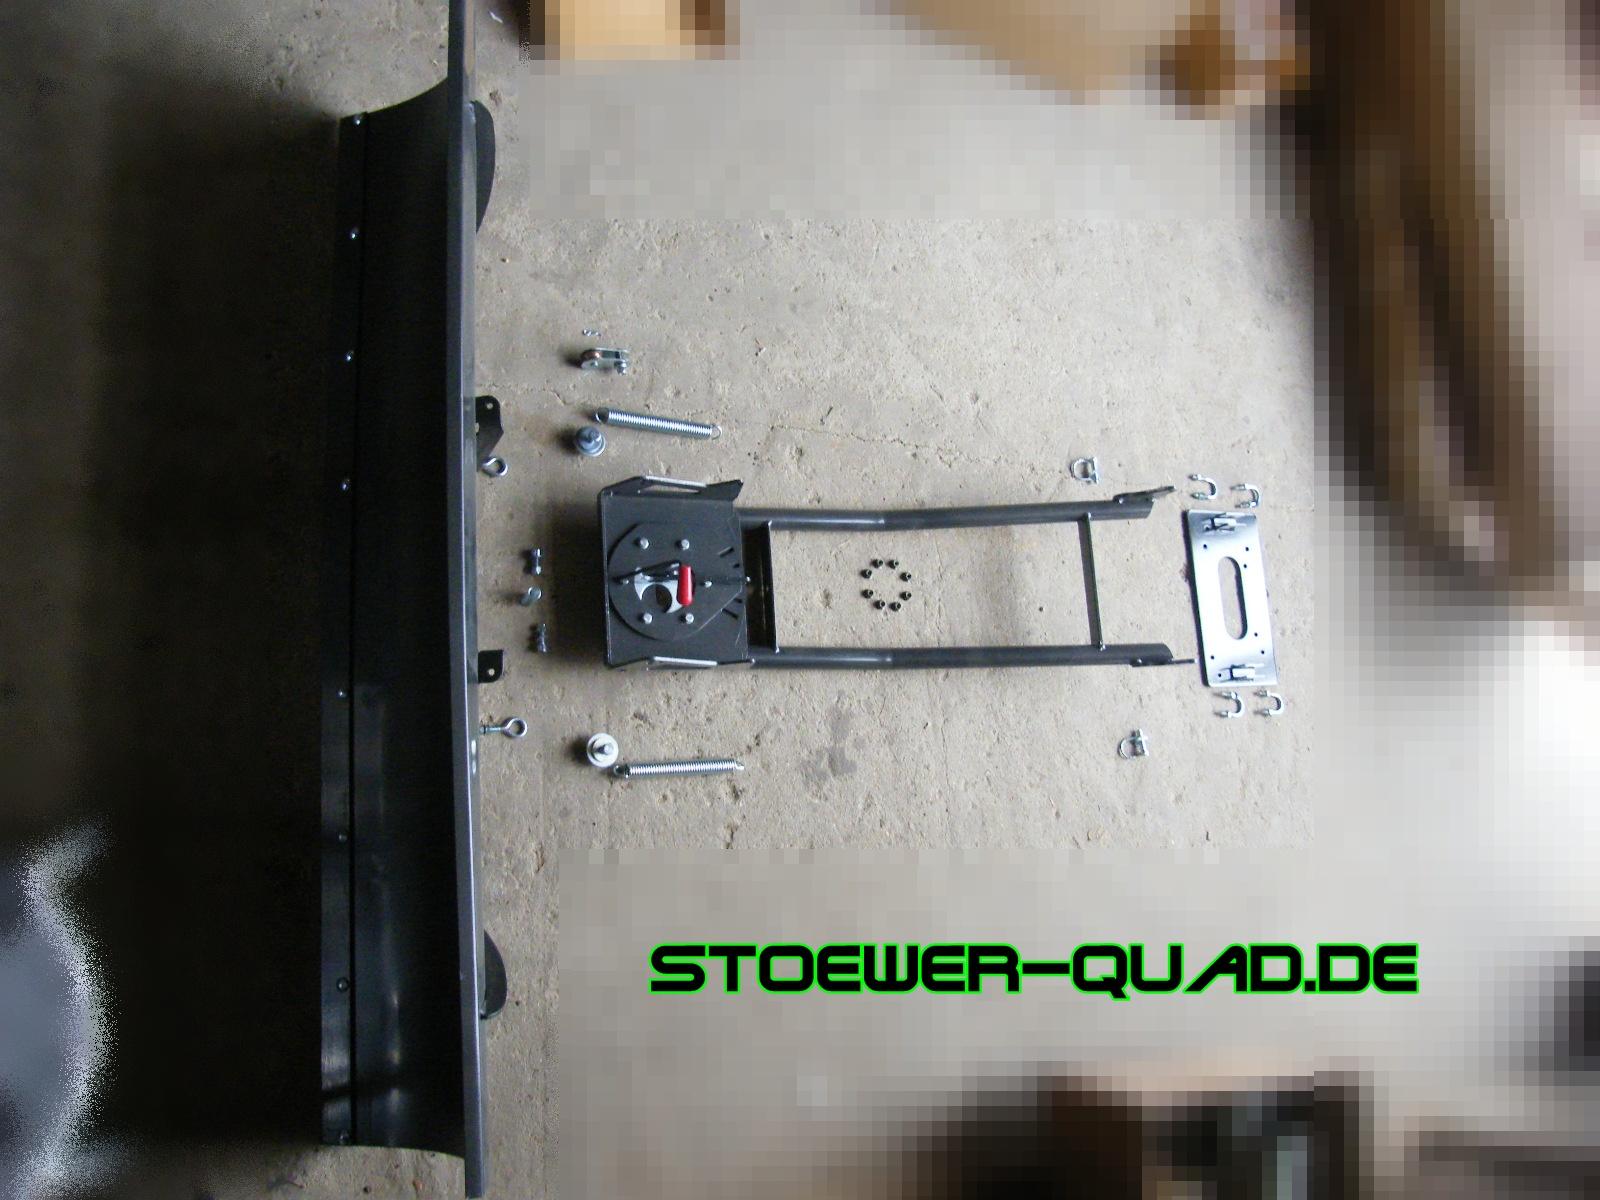 http://quad-schneeschild.quadundmotorrad.de/Teile-008-schneeschild-ATV-700.jpg